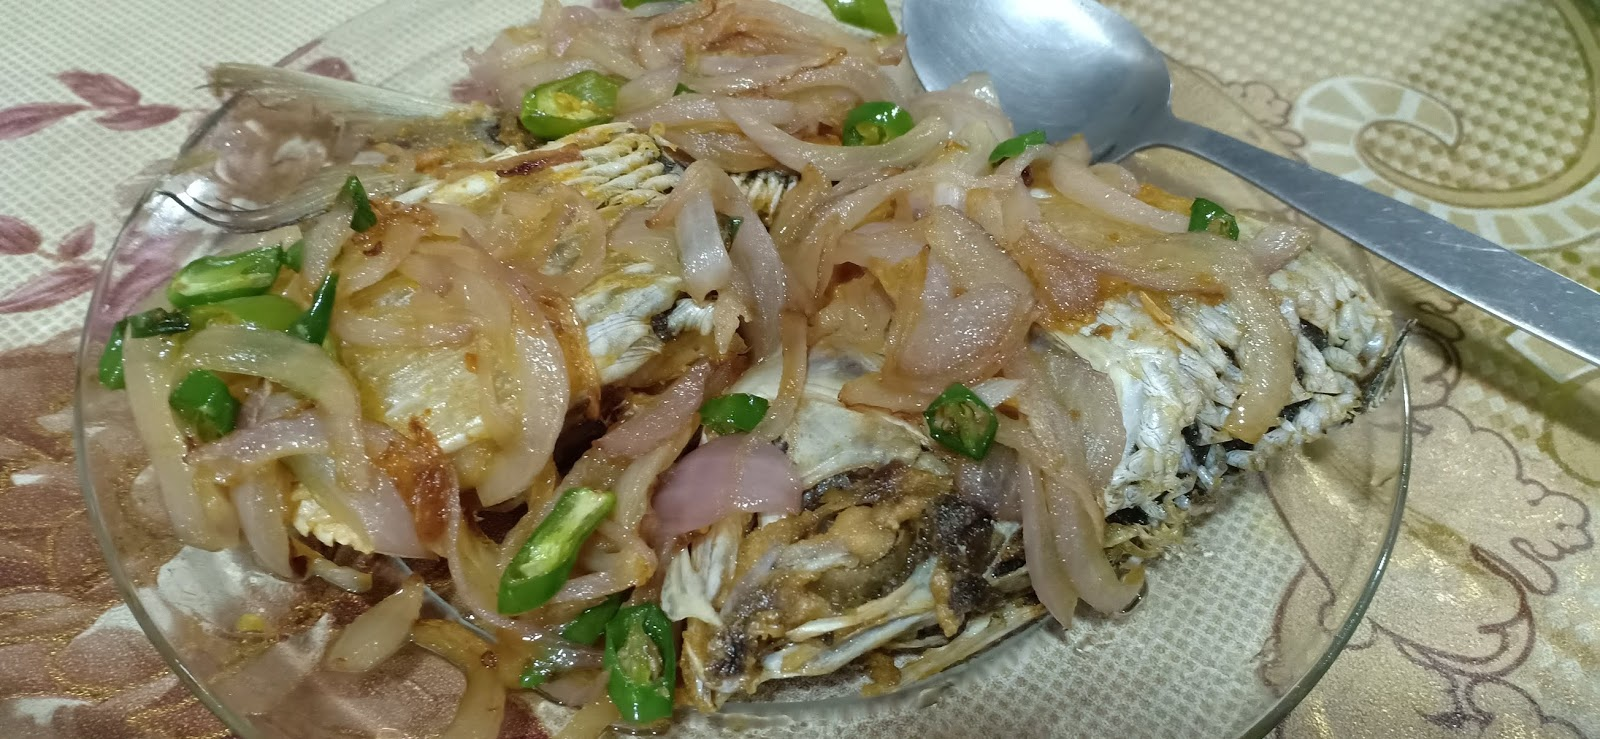 Ikan terubuk masin goreng dengan bawang dan cili padi